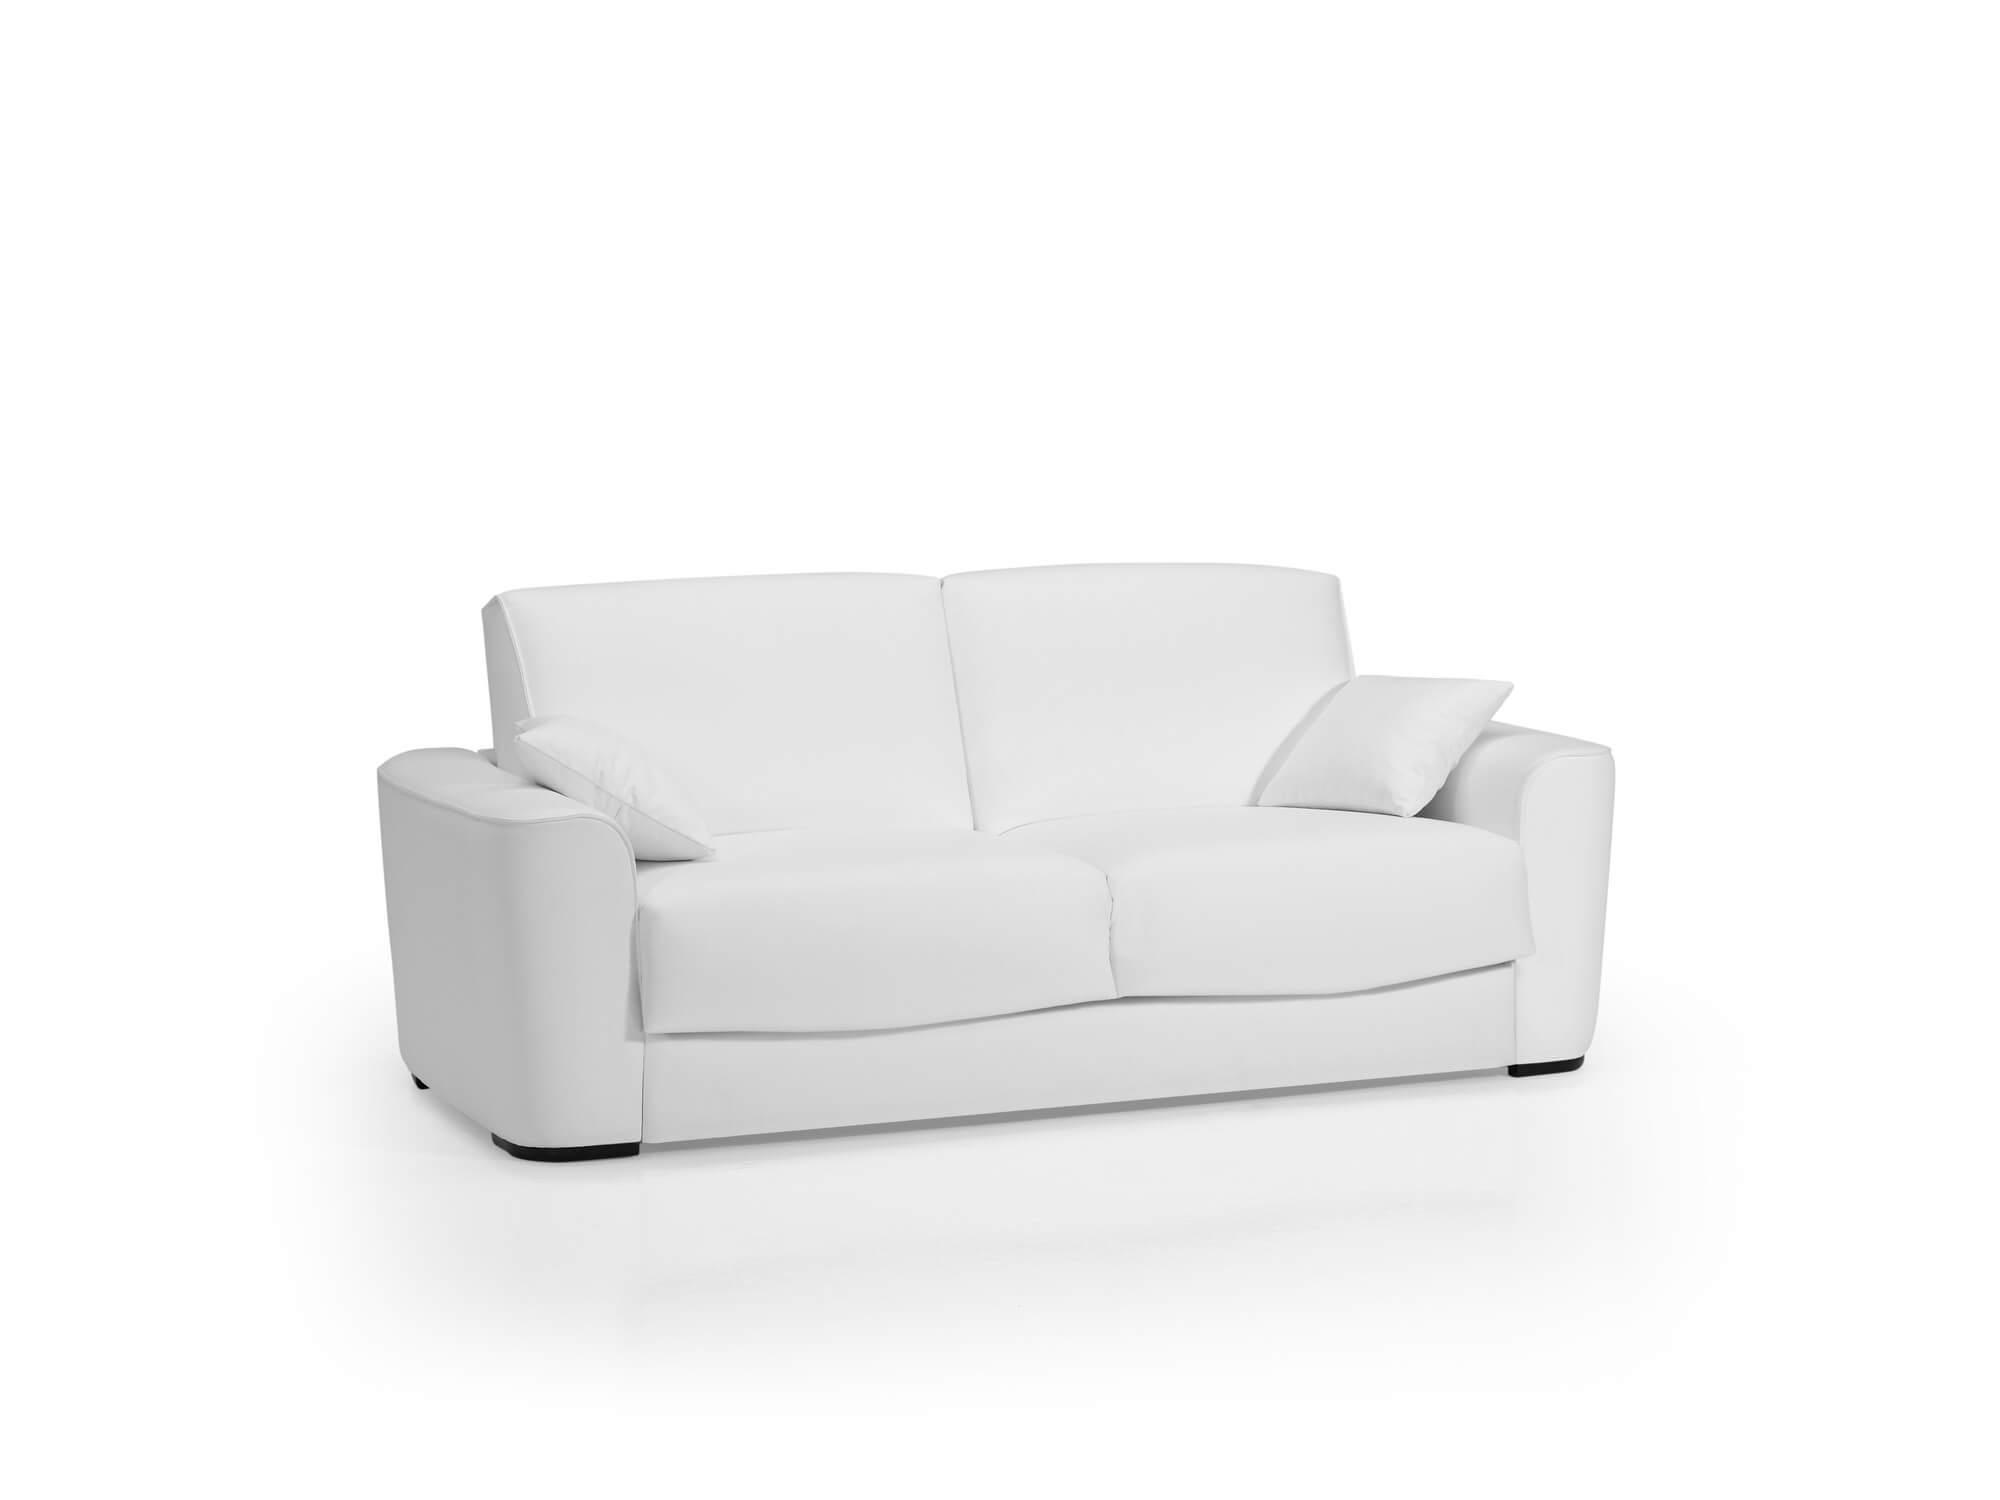 Comprar sof cama una plaza sistema doble cara la mesa for Divan cama de una plaza